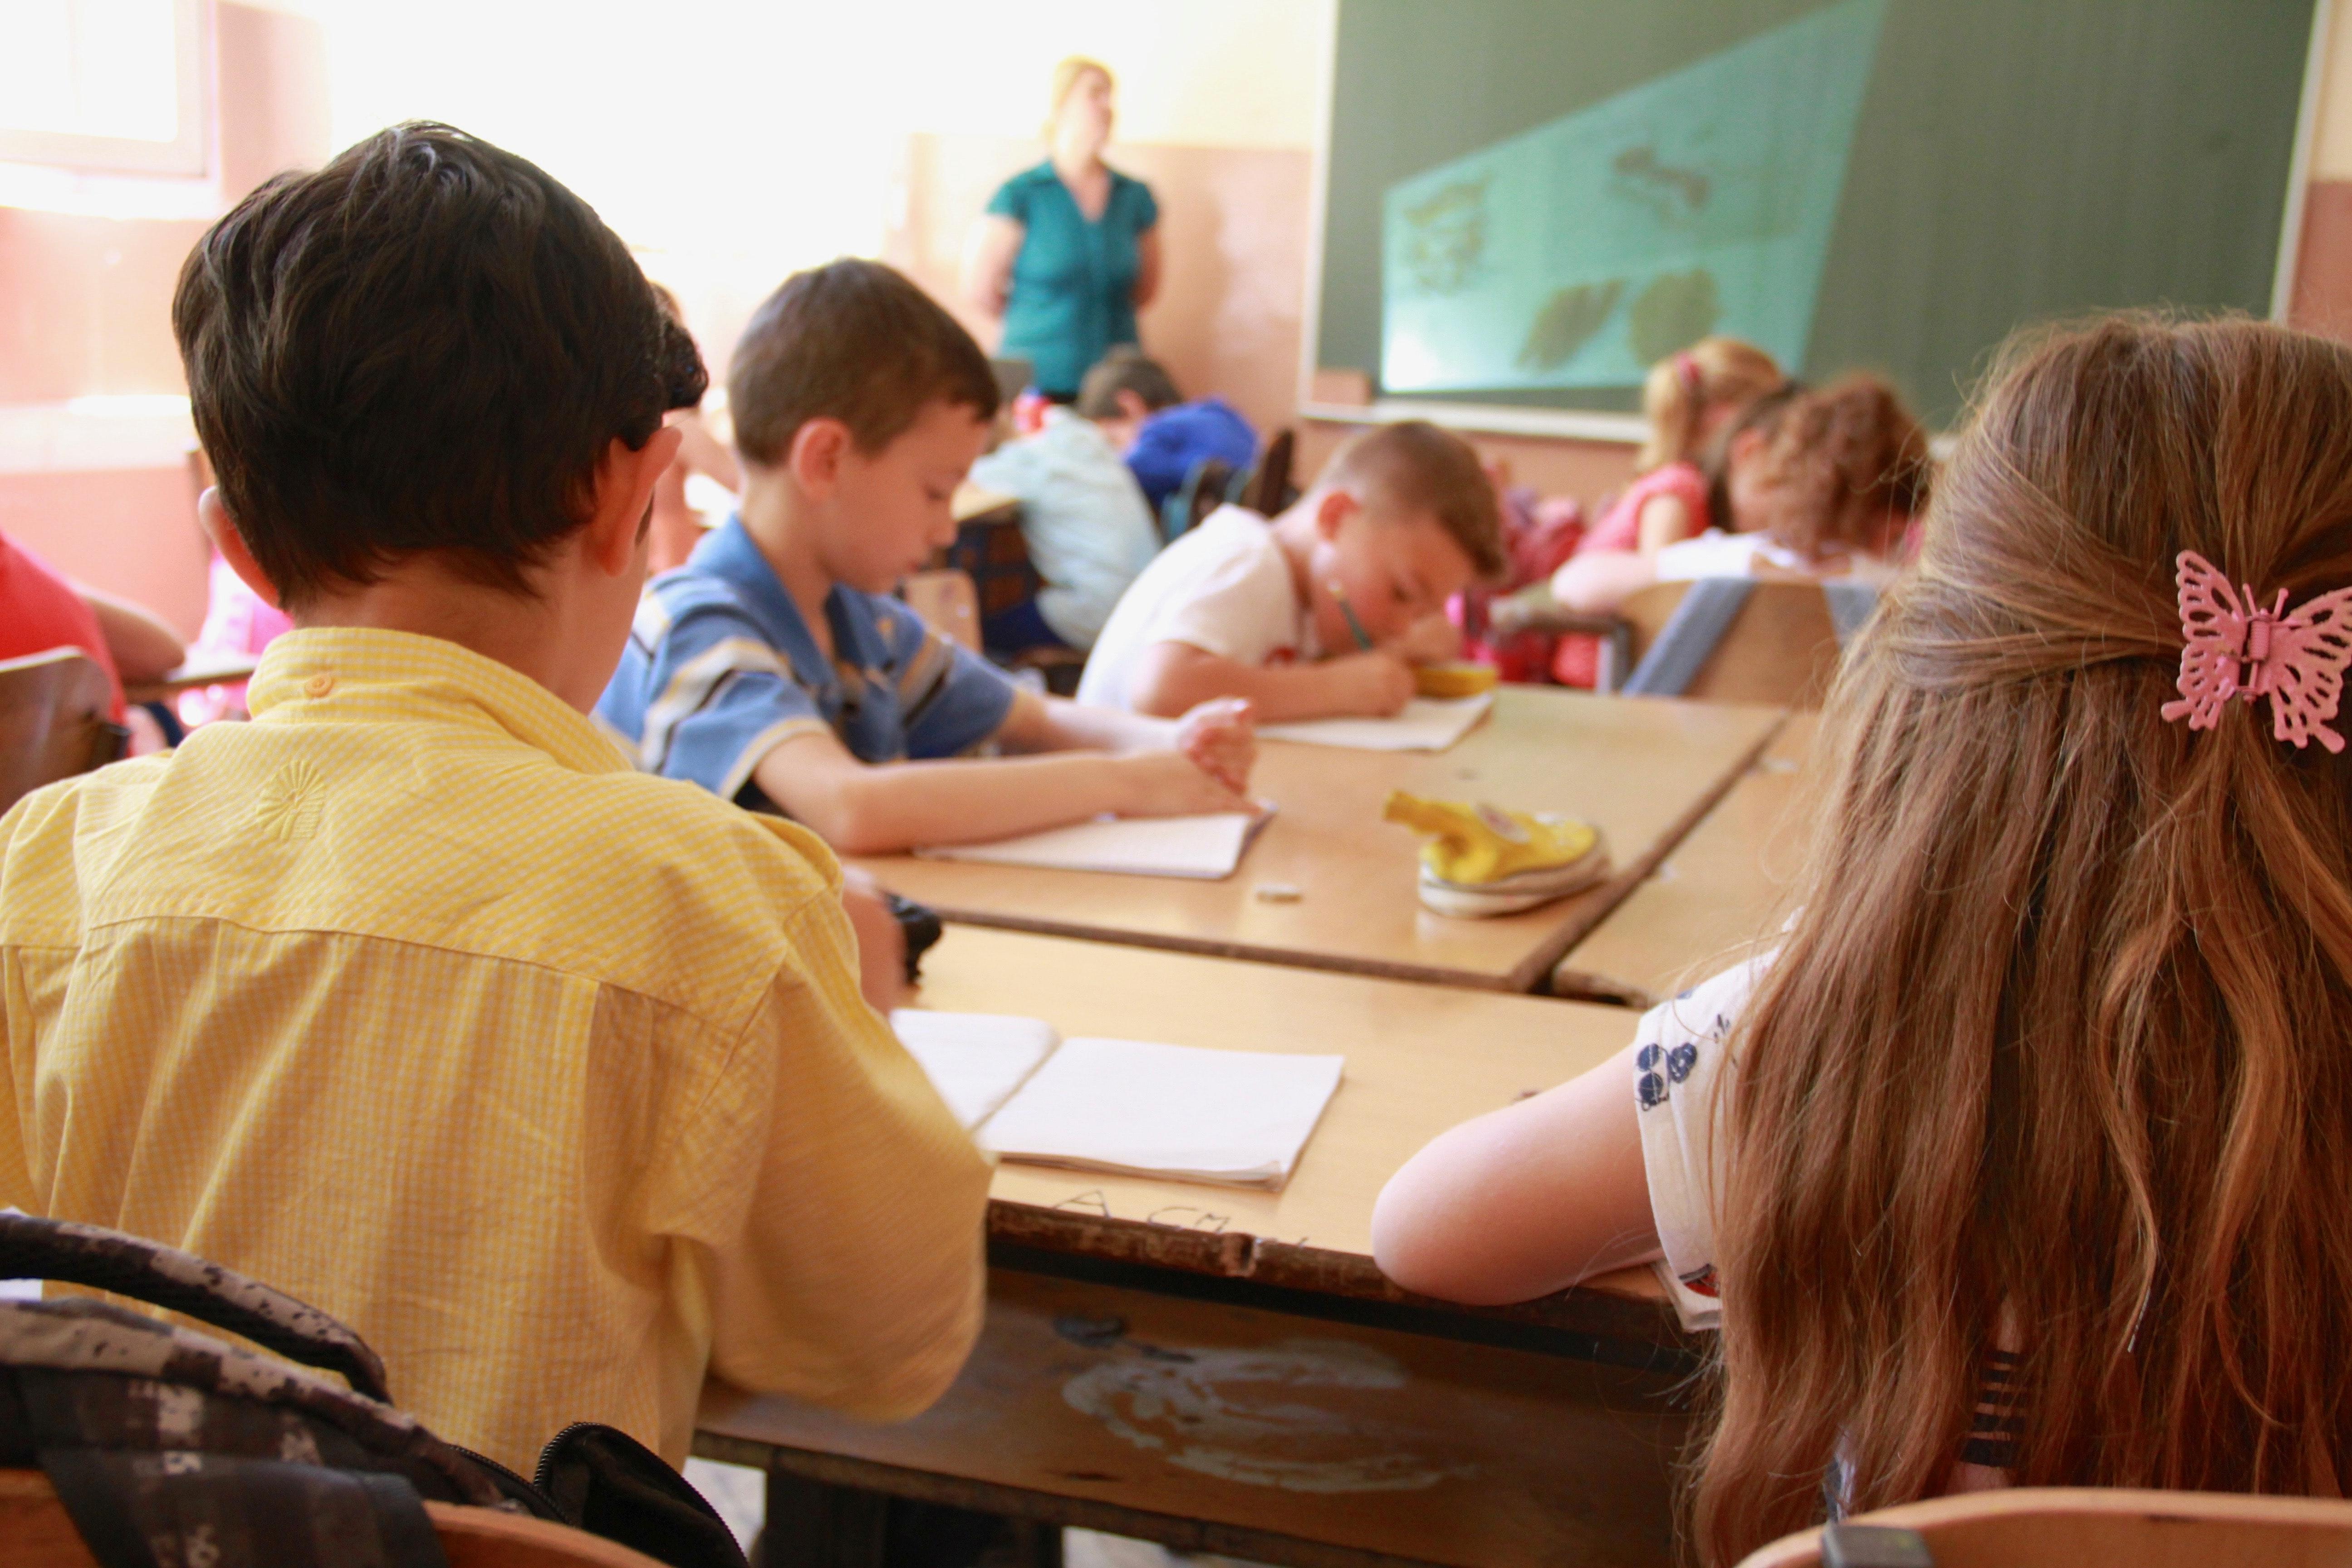 Children sitting in a classroom. Photo courtesy of Megan Soule via Unsplash.